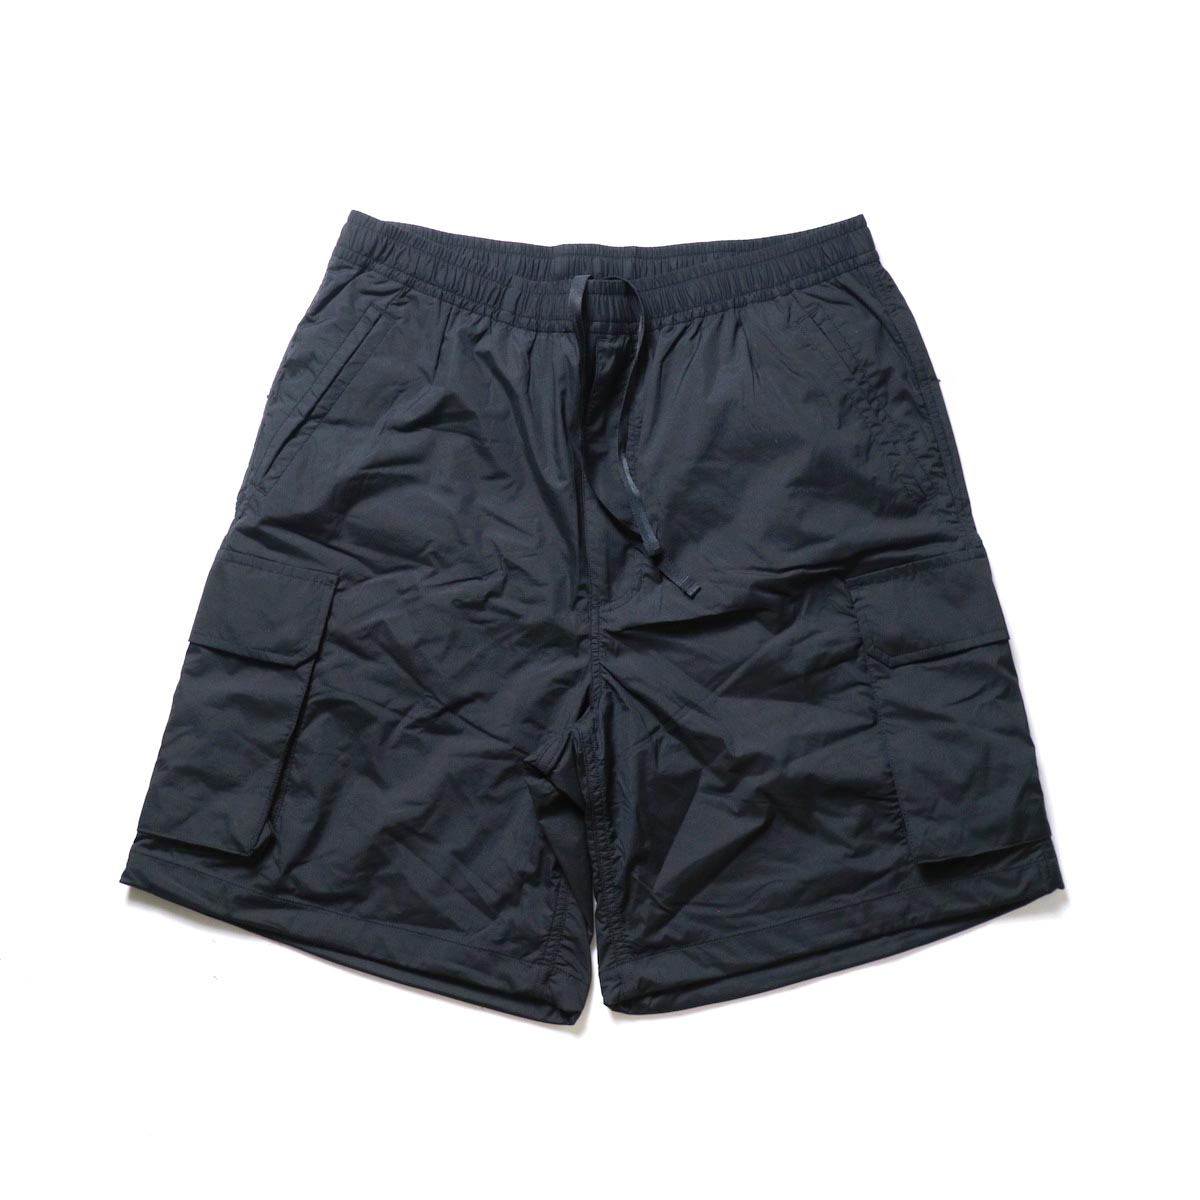 DAIWA PIER39 / Tech French Mil Field Shorts (Black)